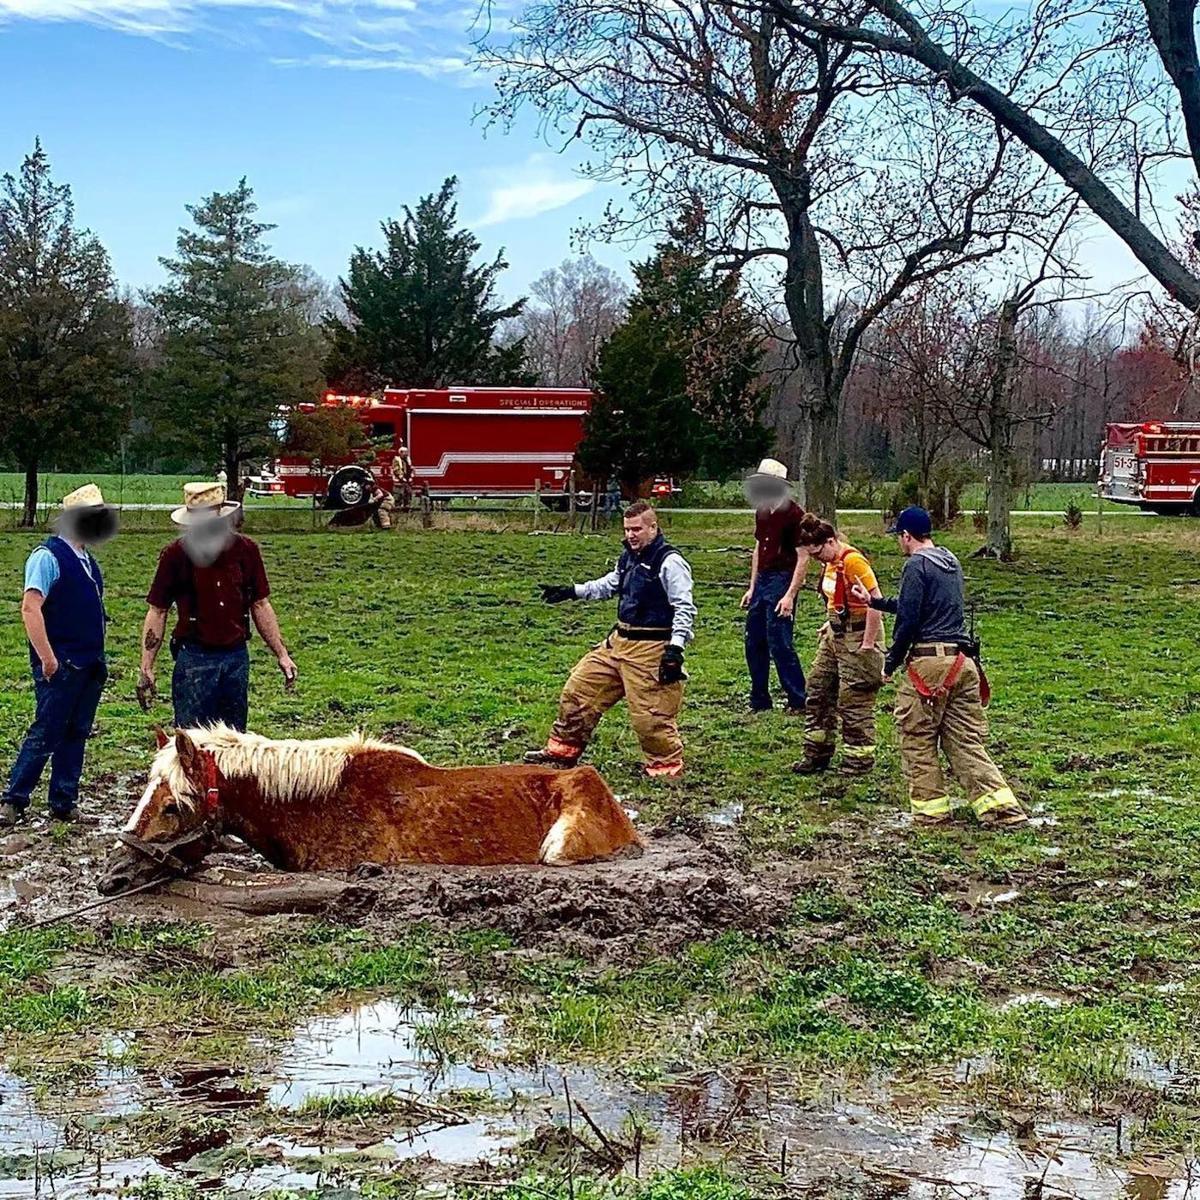 Crews work tirelessly to free horse